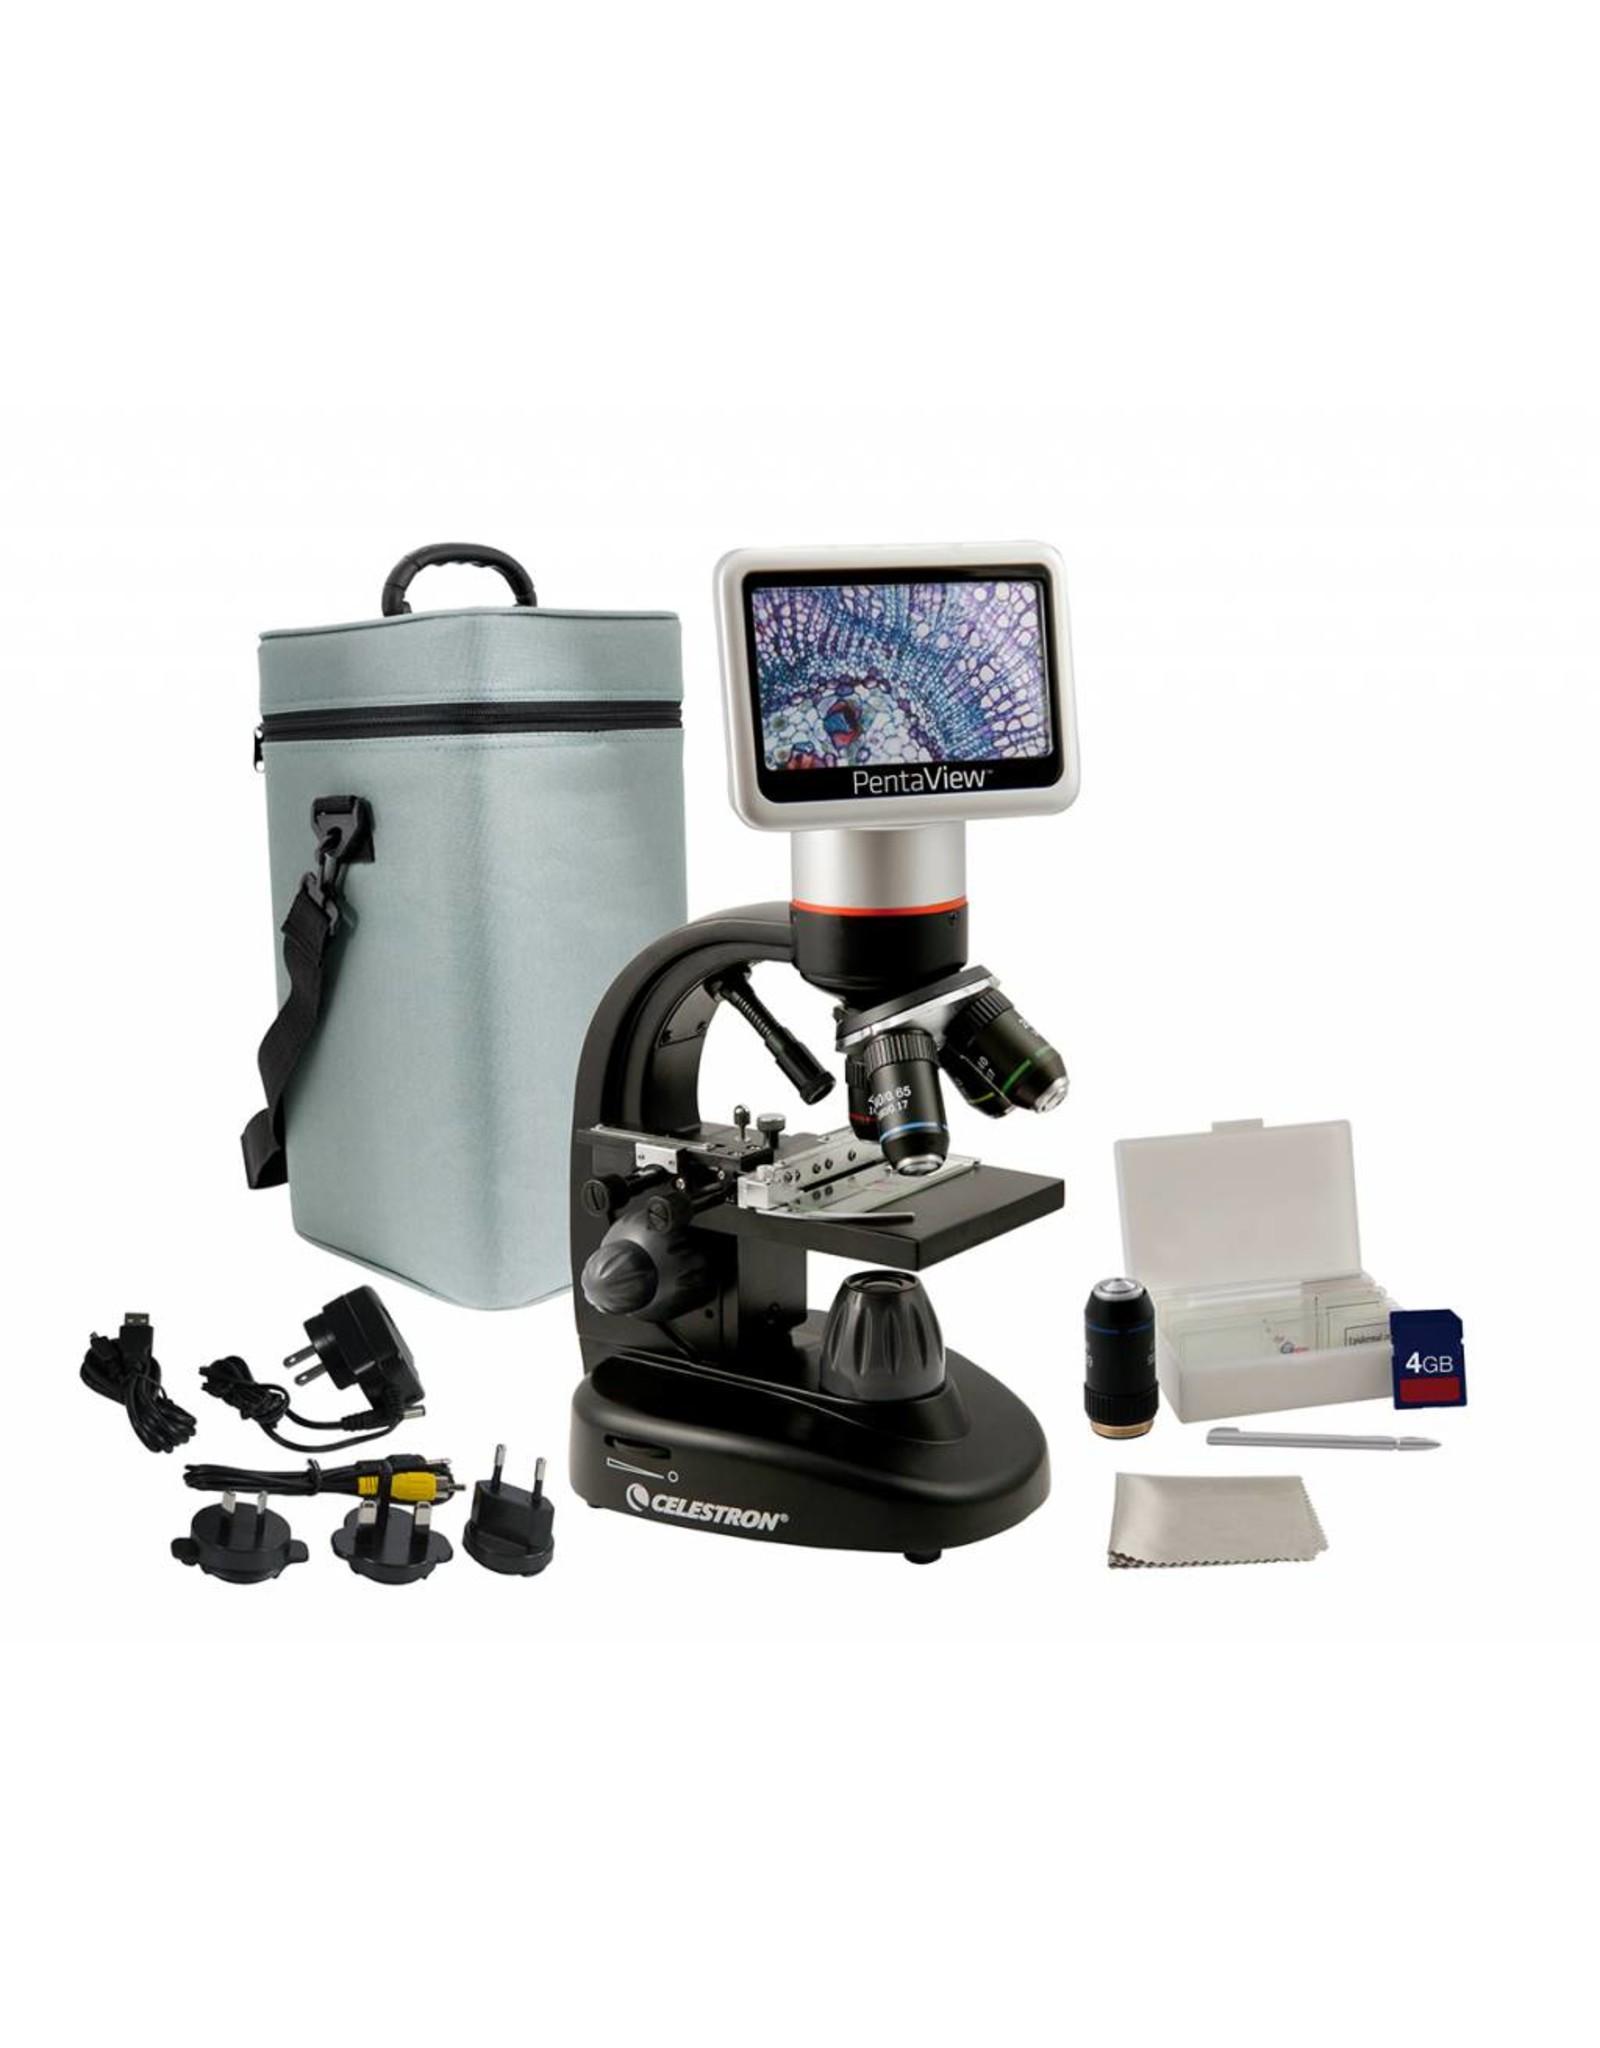 Celestron Celestron PentaView LCD Digital Microscope